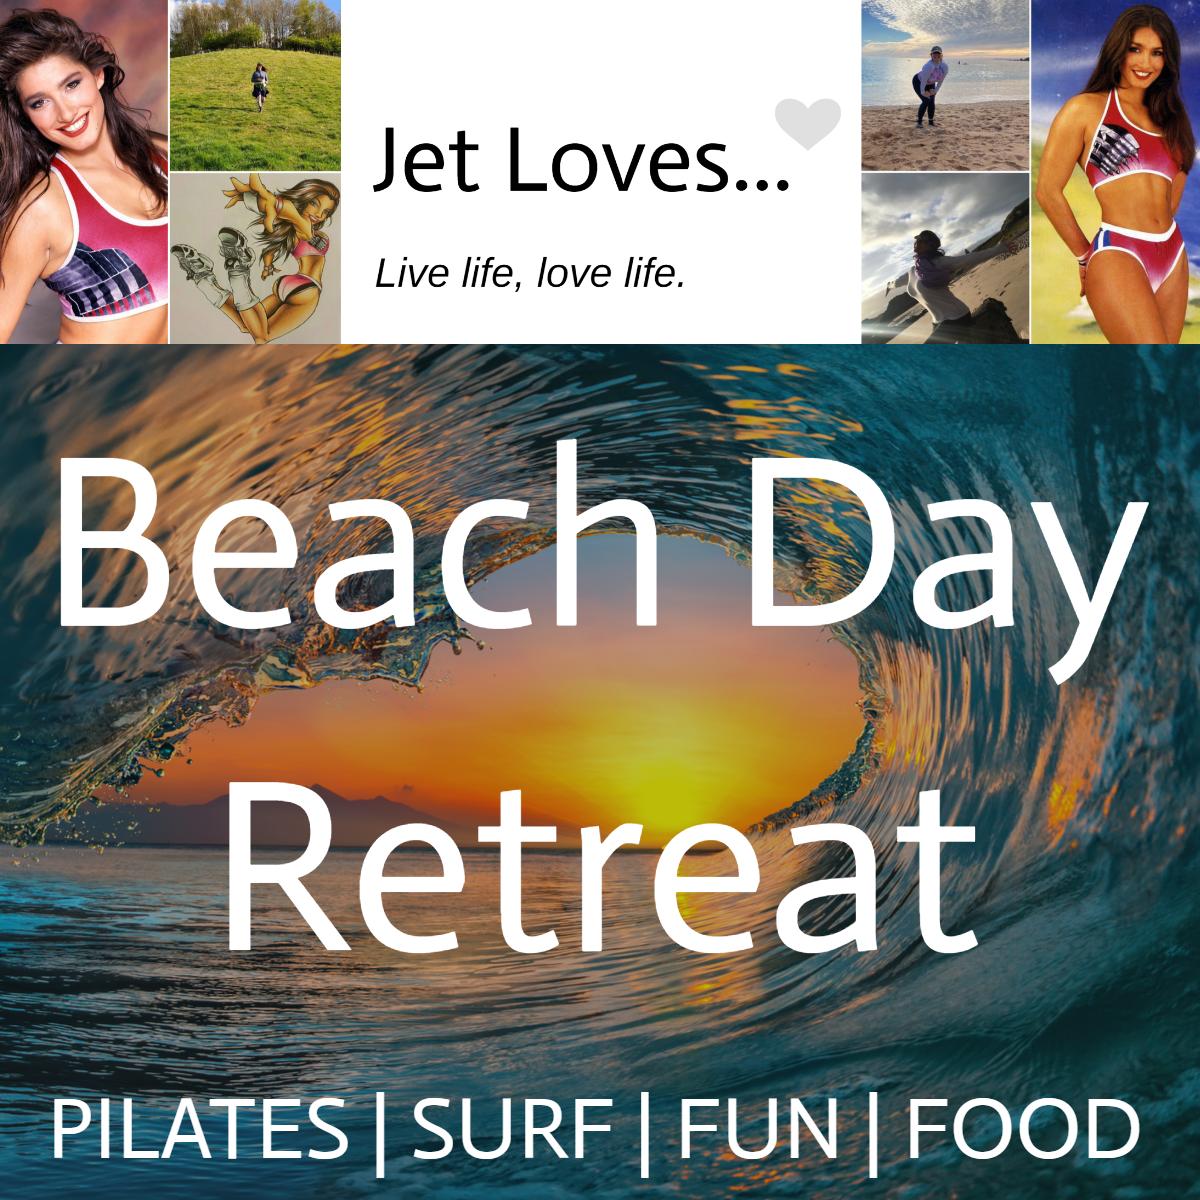 Women Together Beach Day Retreat